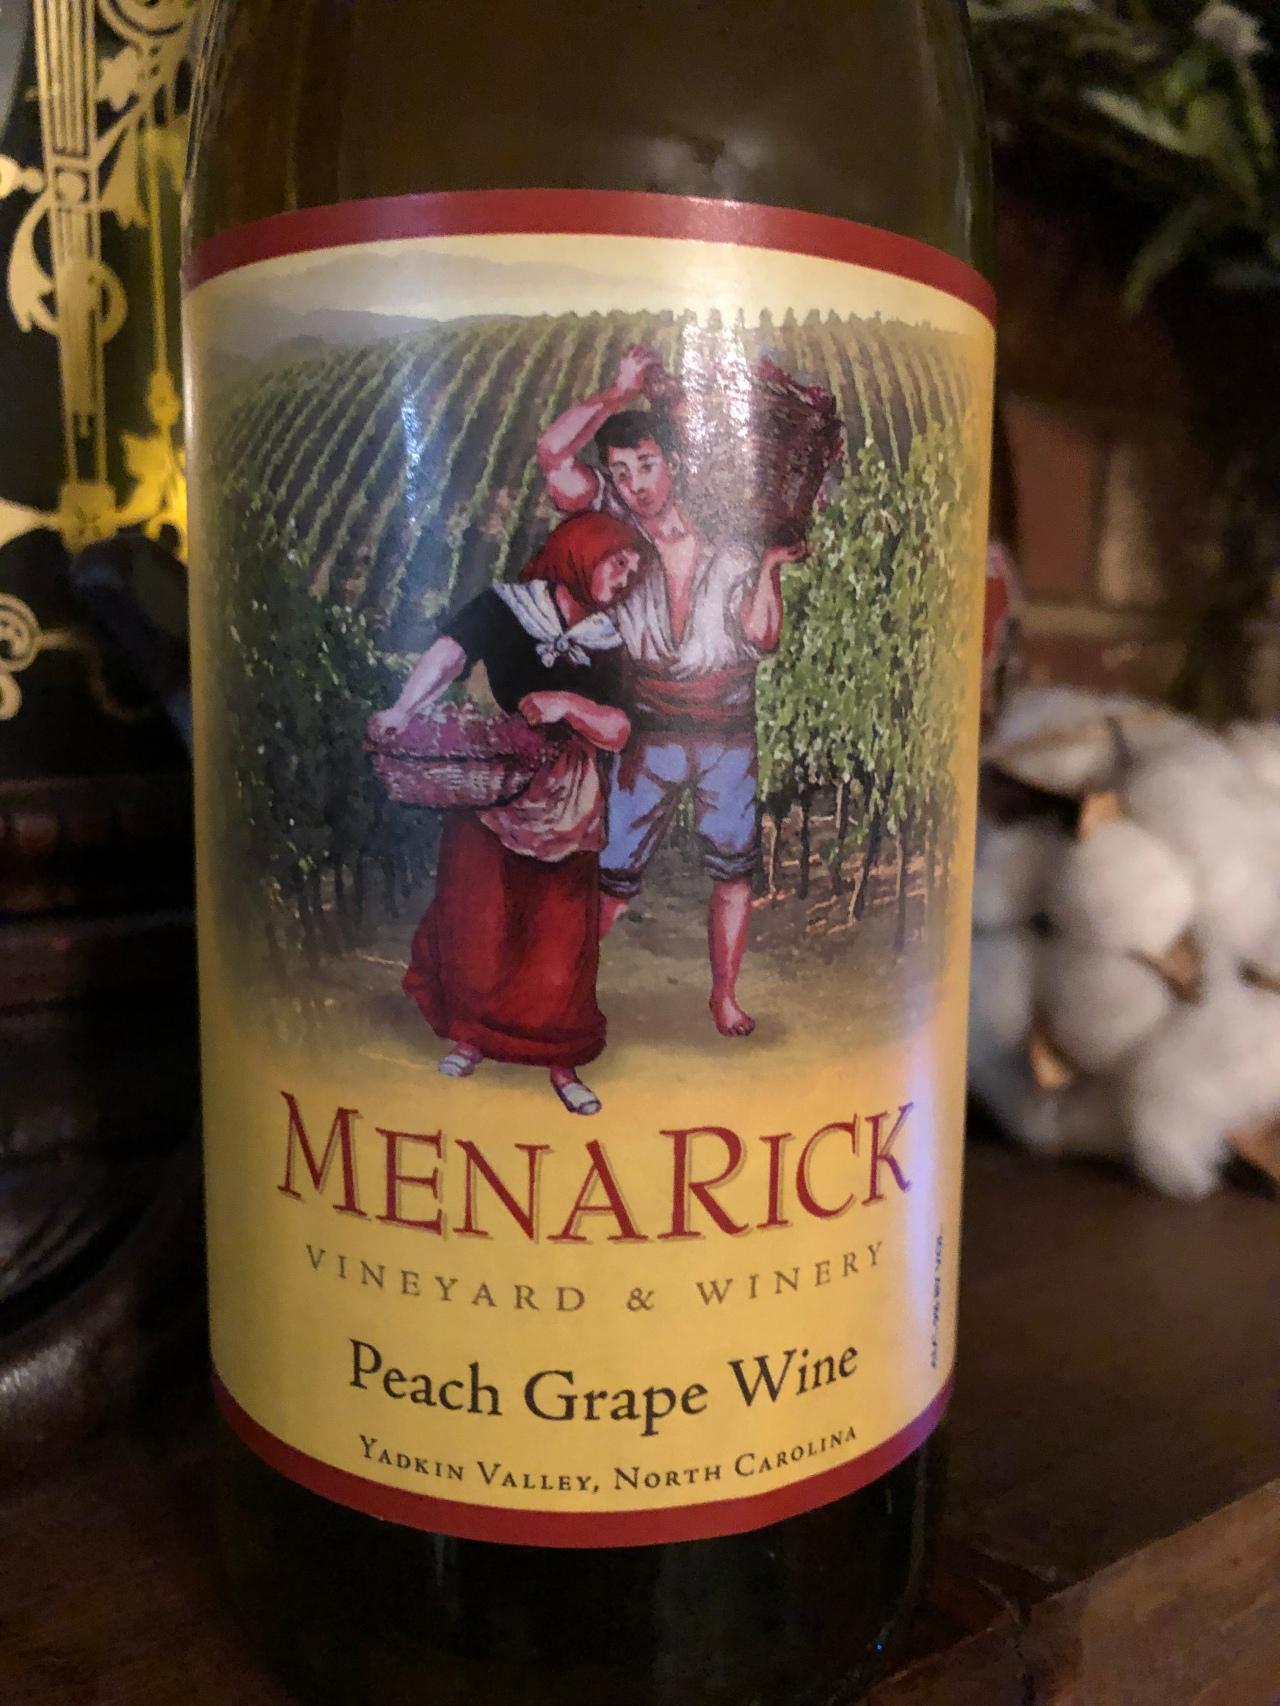 Our Wine Tonight: Peach Grape Wine – MenarickVineyard